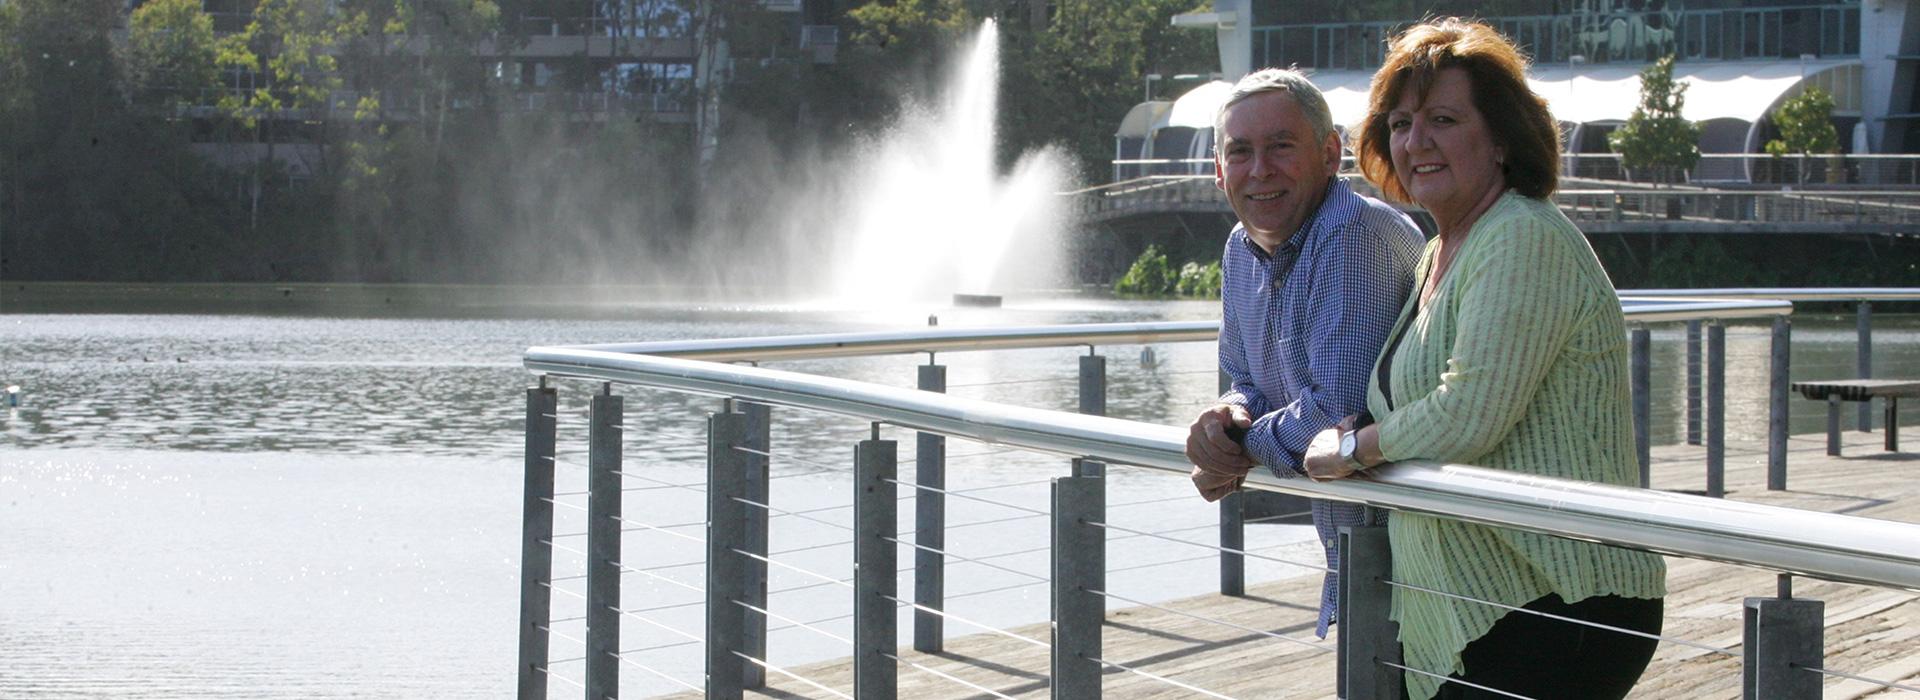 Meet the Macgregor Frasers locals since 1982